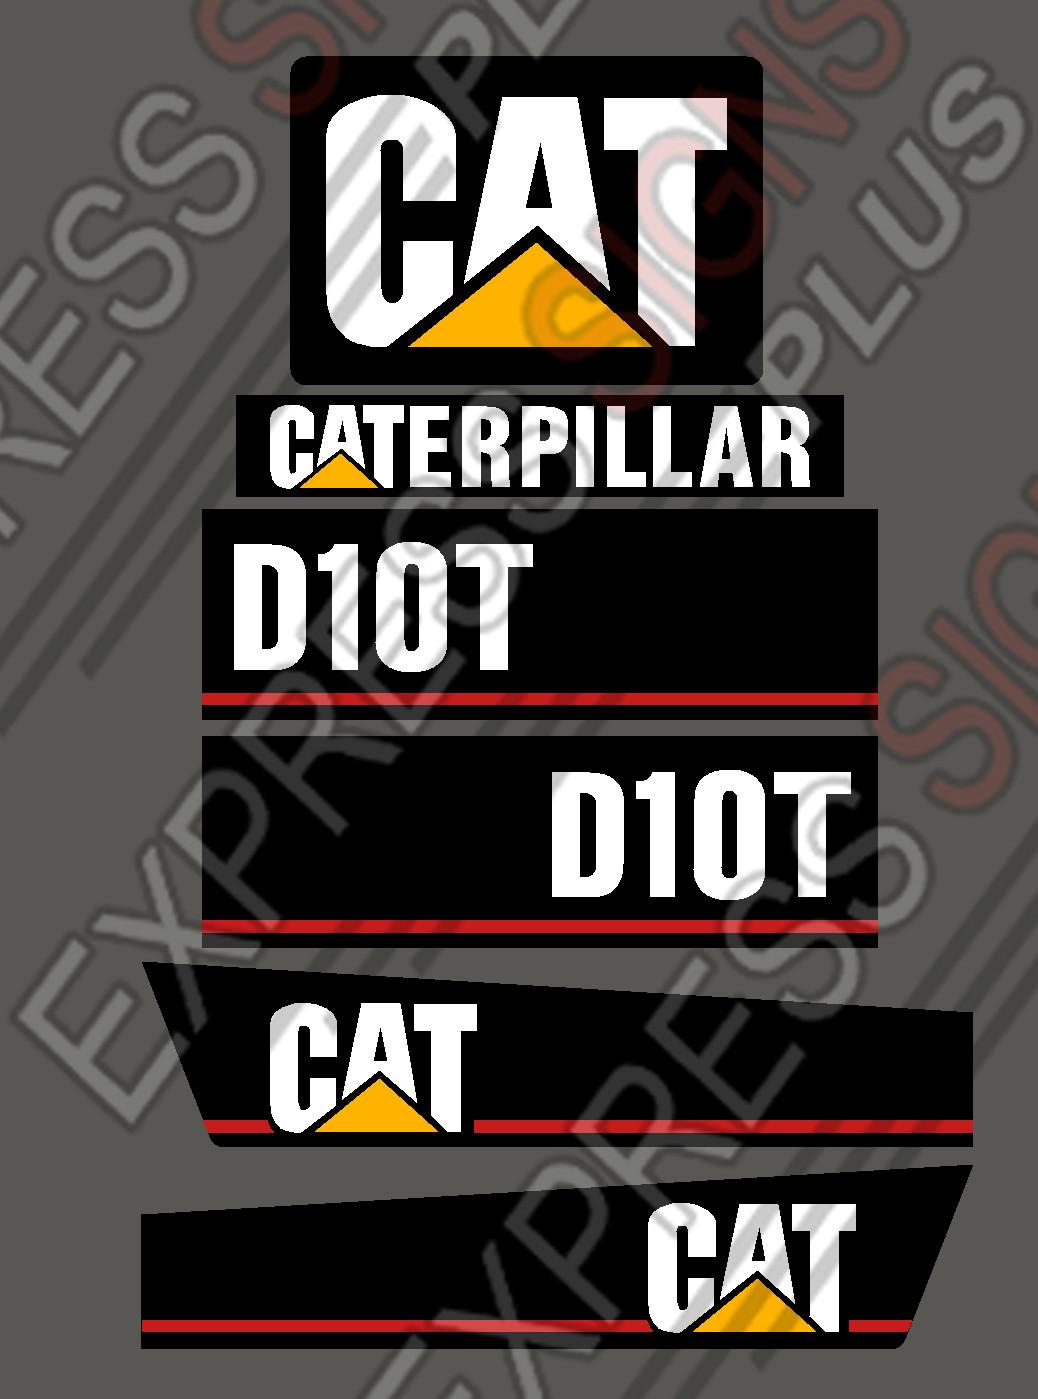 Caterpillar dozer d10t new pyramid style